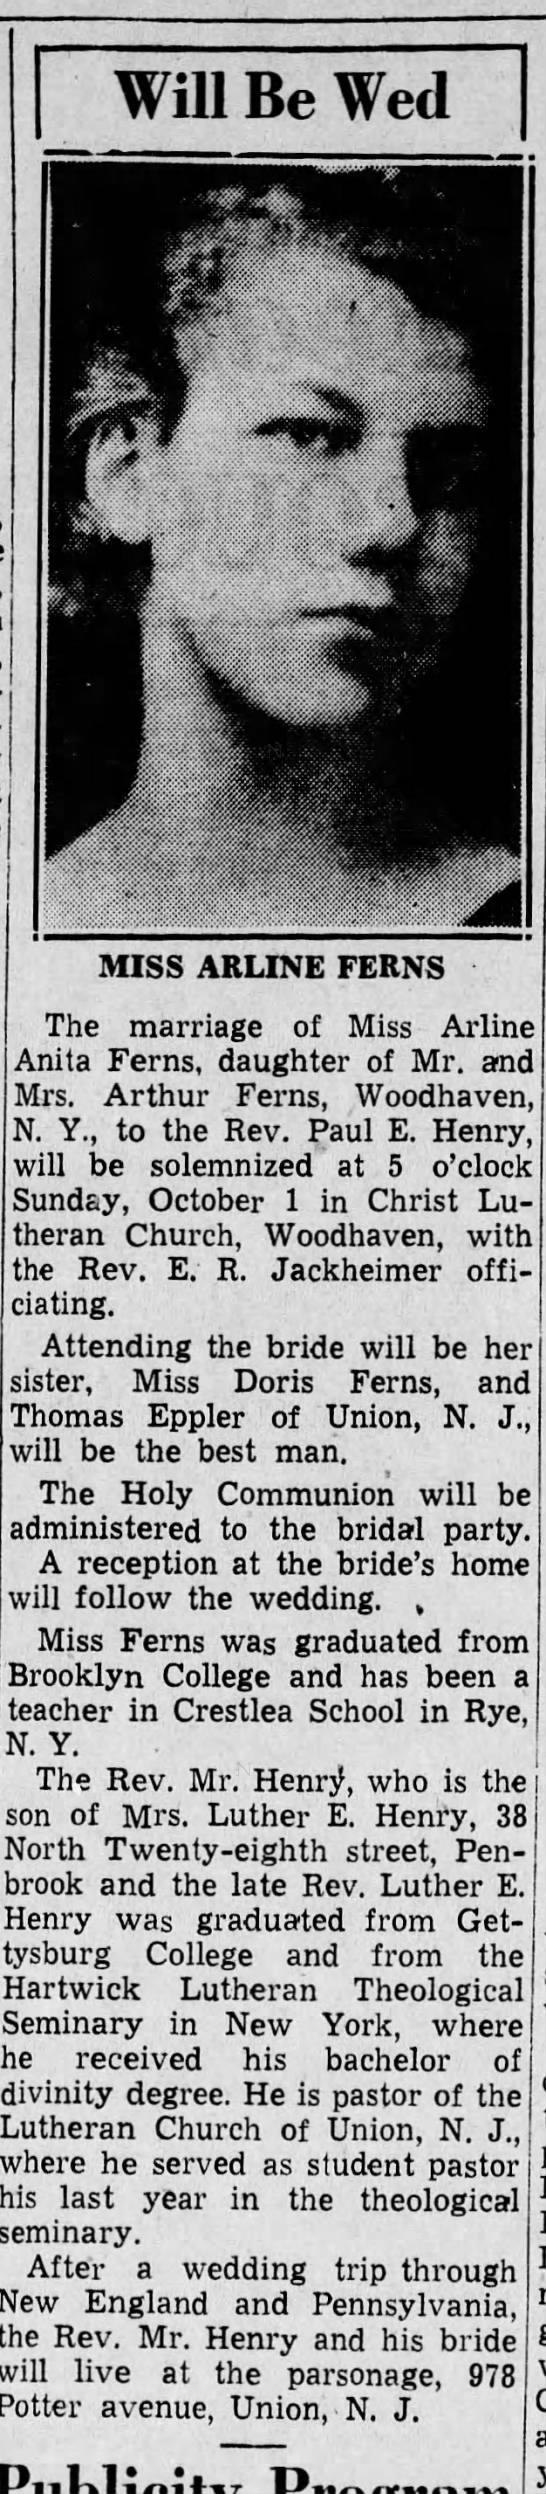 Harrisburg Telegraph 9-27-1939 -